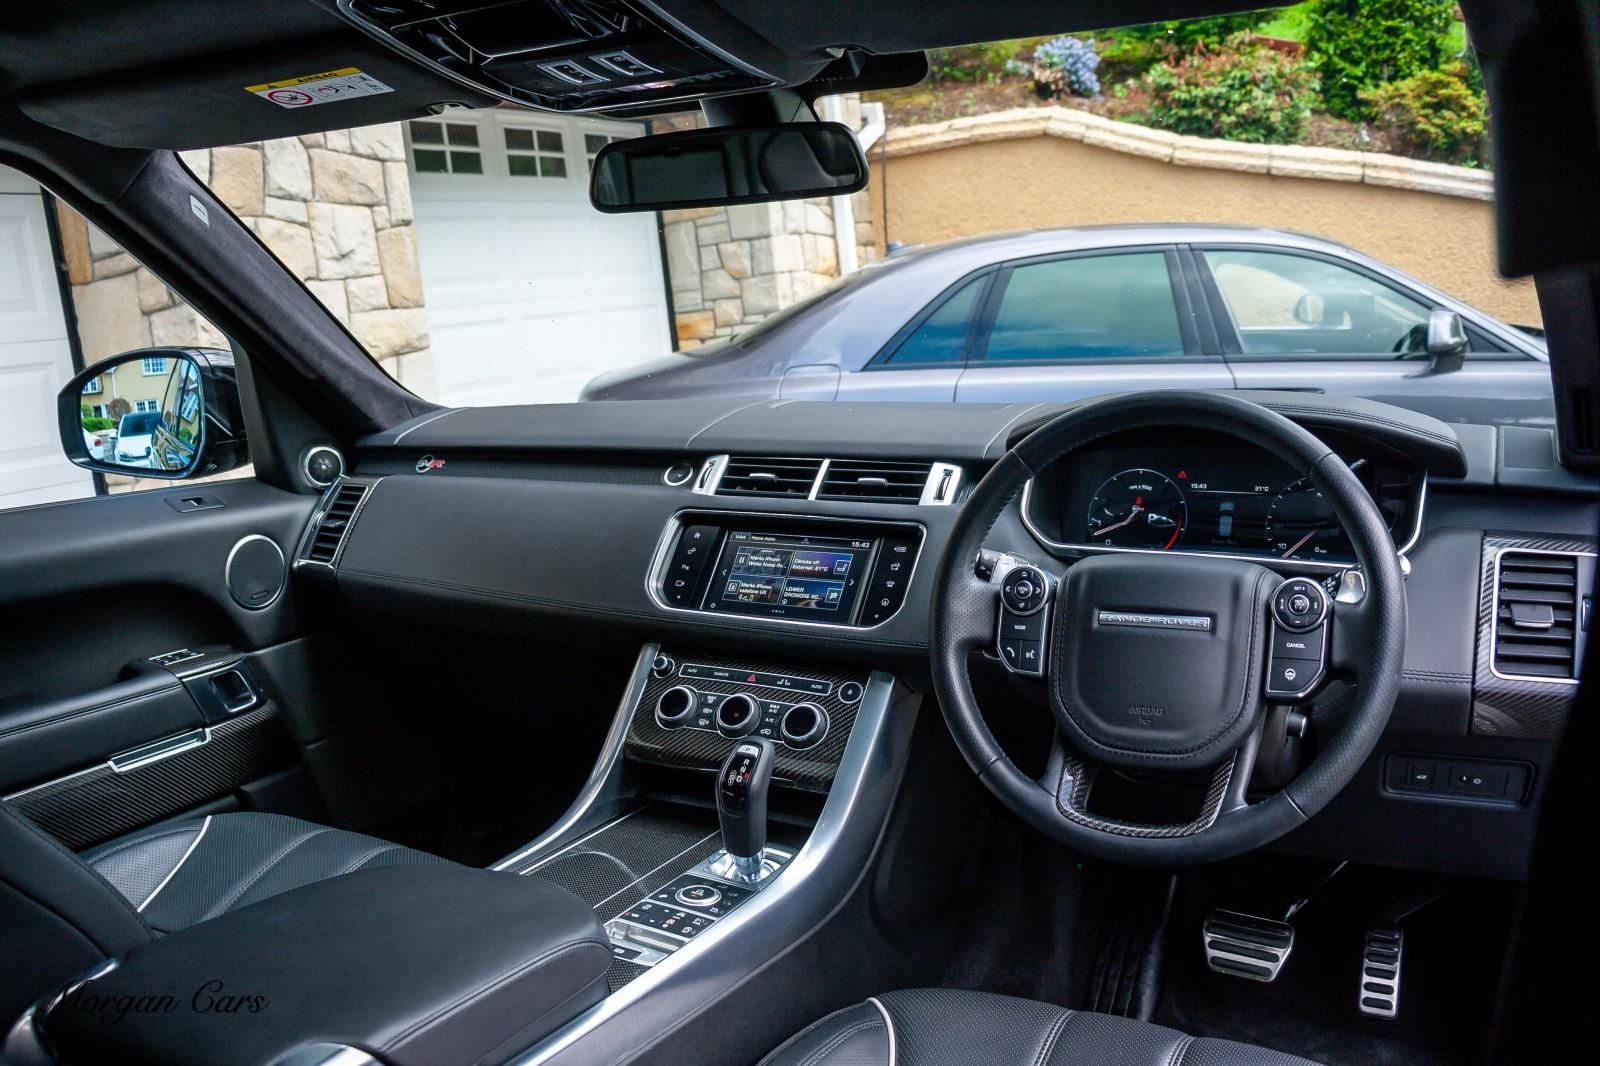 2015 Land Rover Range Rover Sport V8 5.0 SVR Petrol Automatic – Morgan Cars 9 Mound Road, Warrenpoint, Newry BT34 3LW, UK full